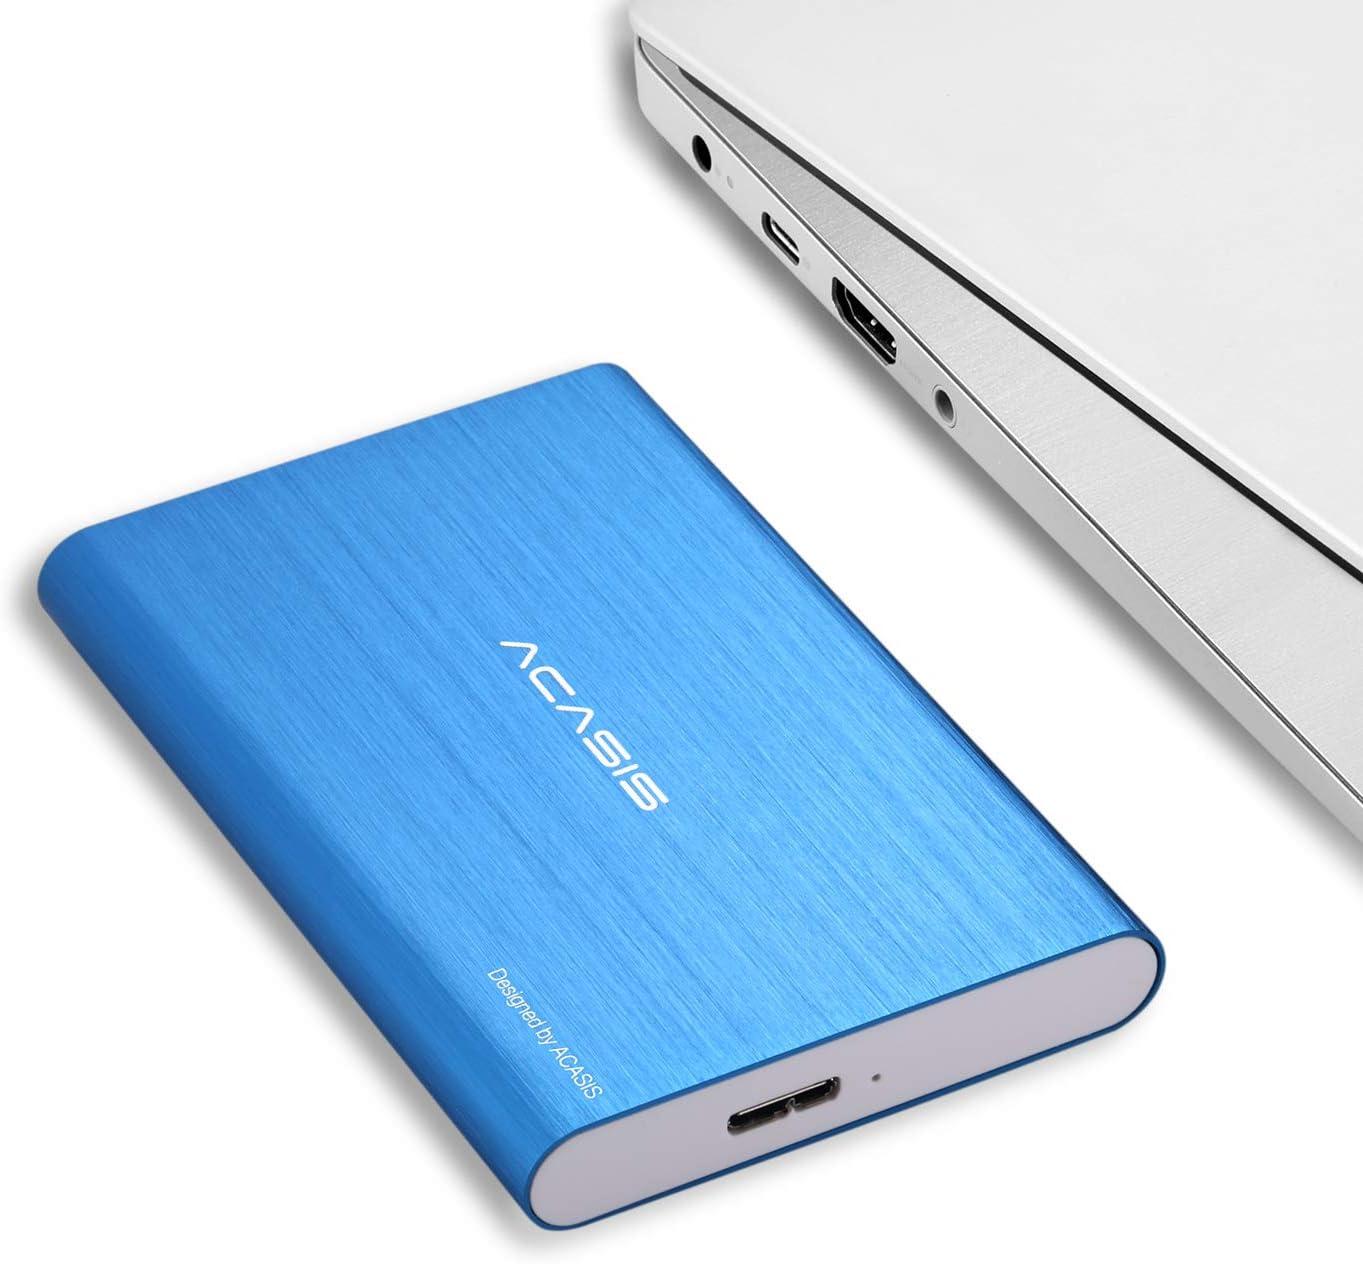 "HDD 2.5"" 120GB Portable External Hard Drive USB3.0 Hard Disk Storage Devices Desktop Laptop (Blue)"